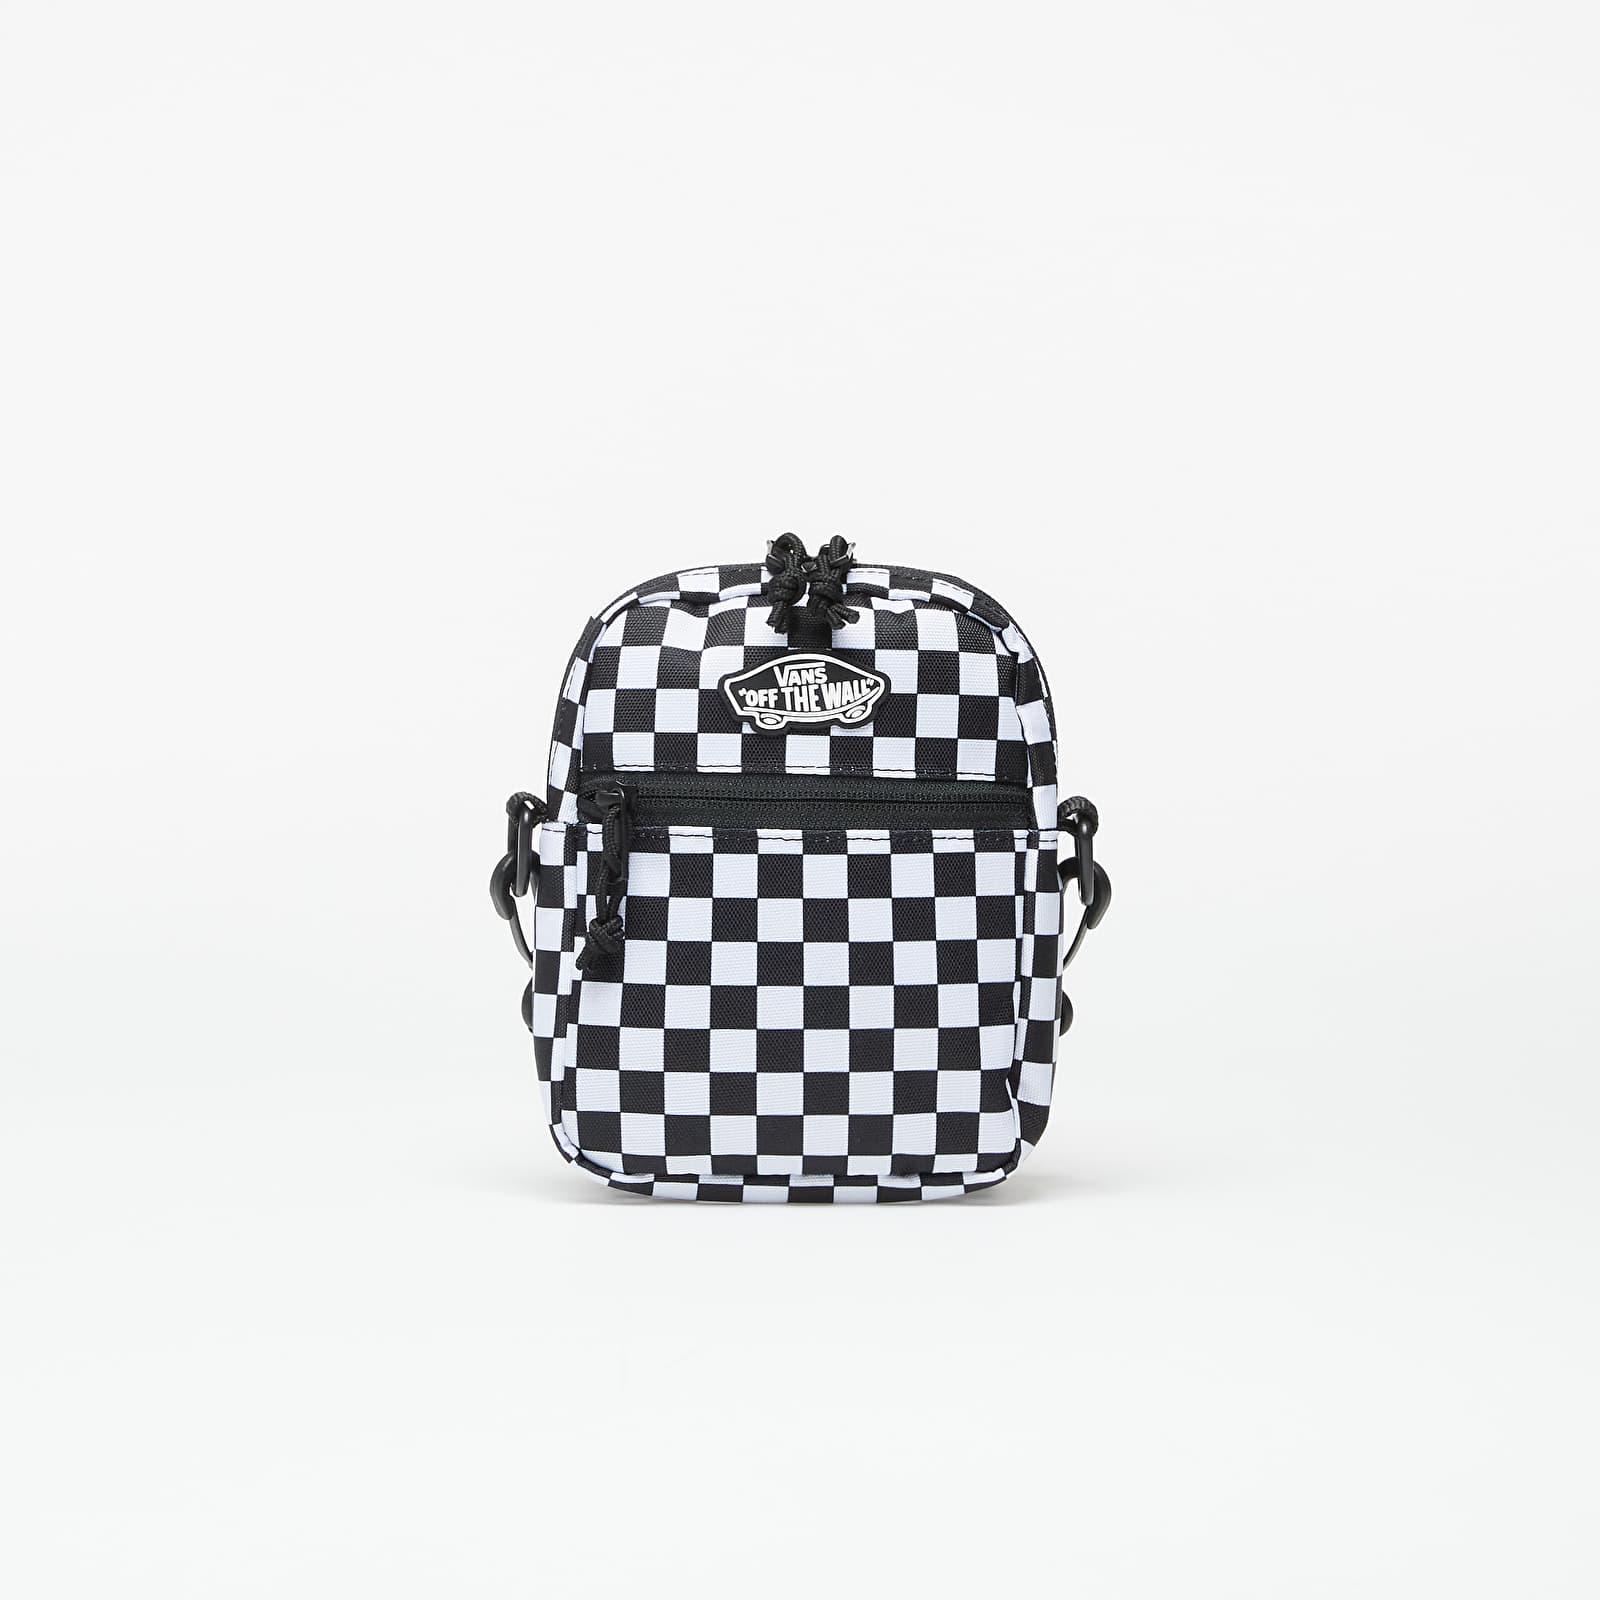 Tašky přes rameno Vans Street Ready II Crossbody Black/ White Checkerboard